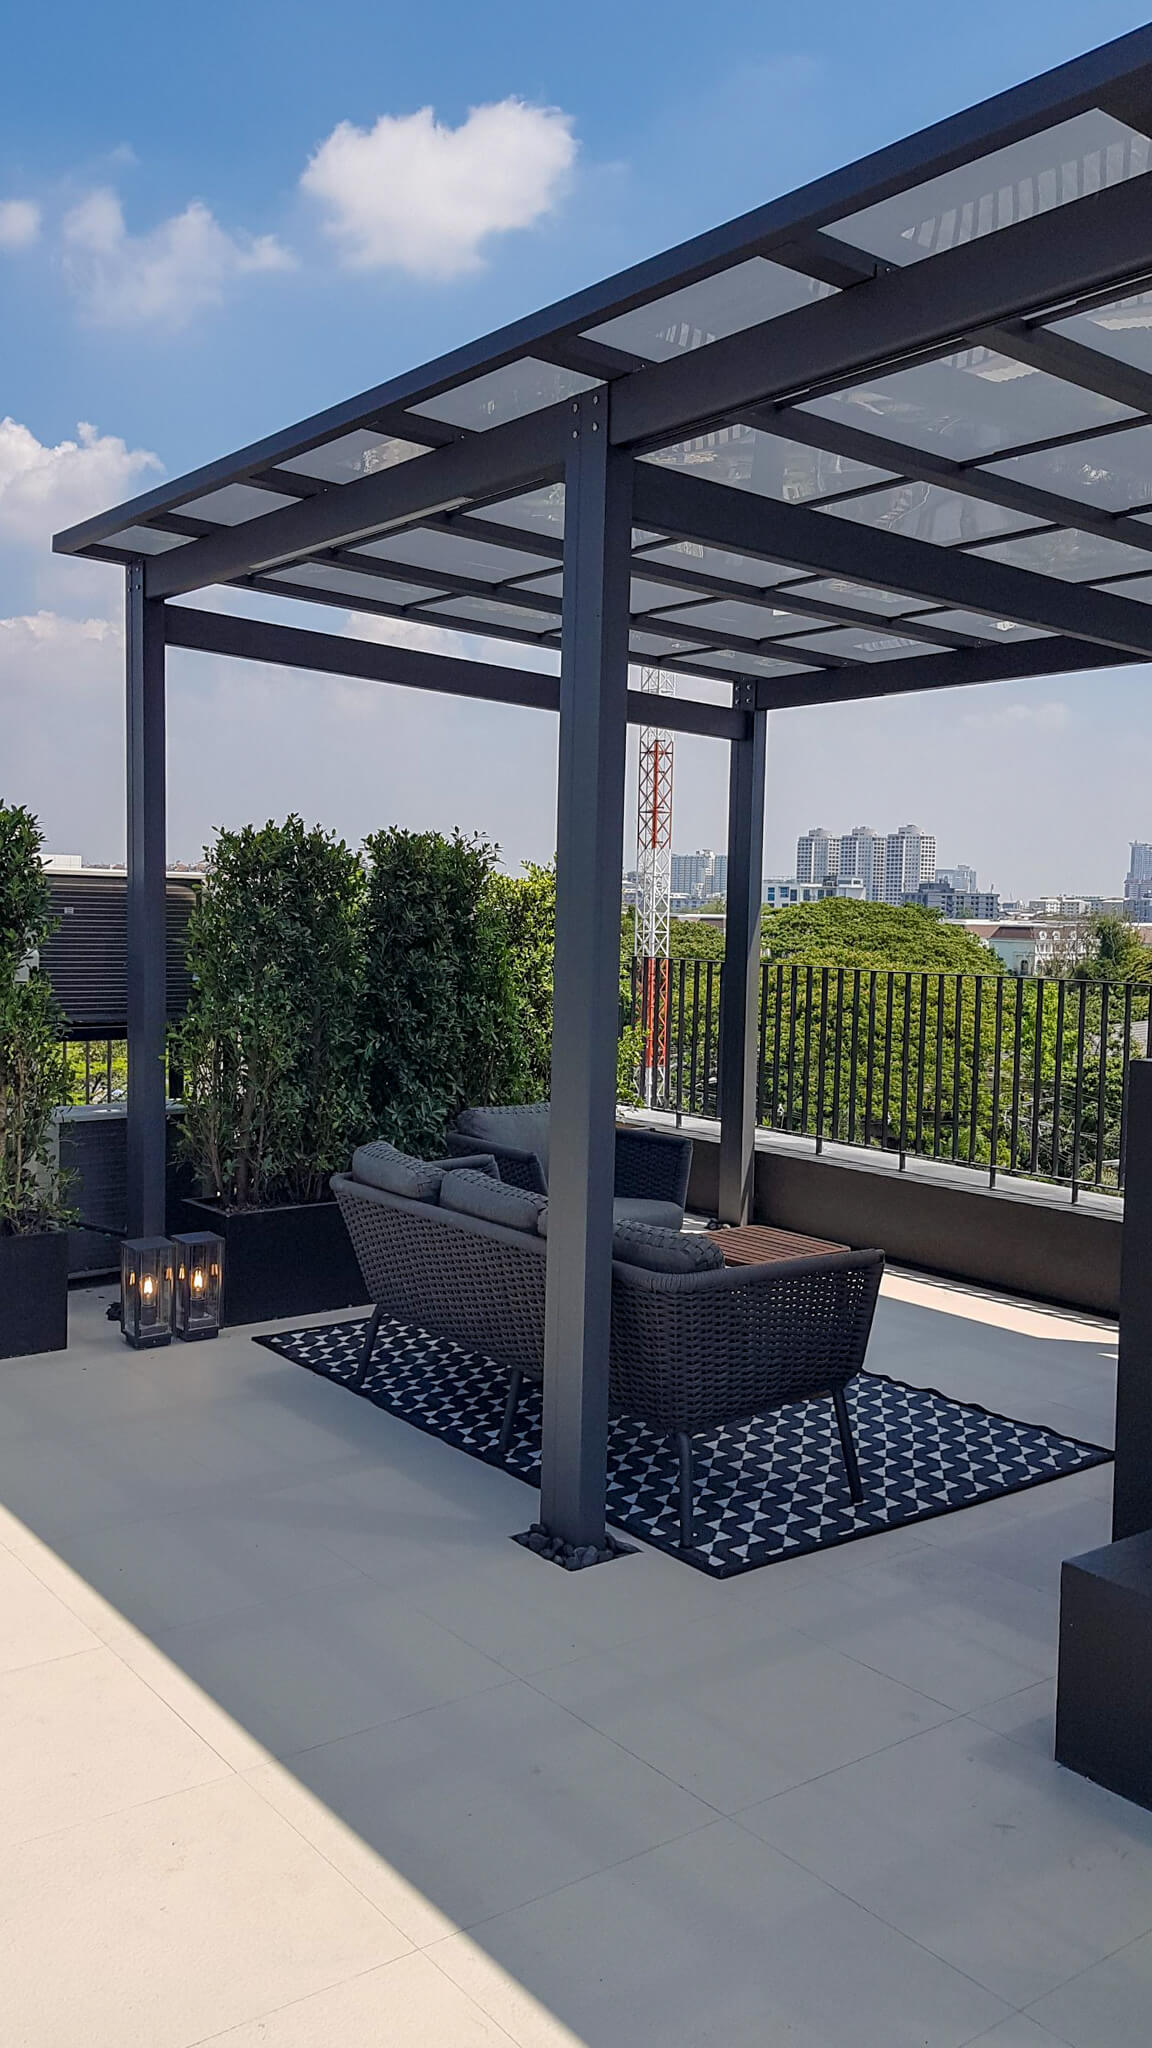 AIRES RAMA9 รีวิว Luxury Townhome 3.5 ชั้น + Rooftop ออกแบบสวย ย่านพระราม9 (ใกล้ รพ.สมิติเวช) 85 - AIRES